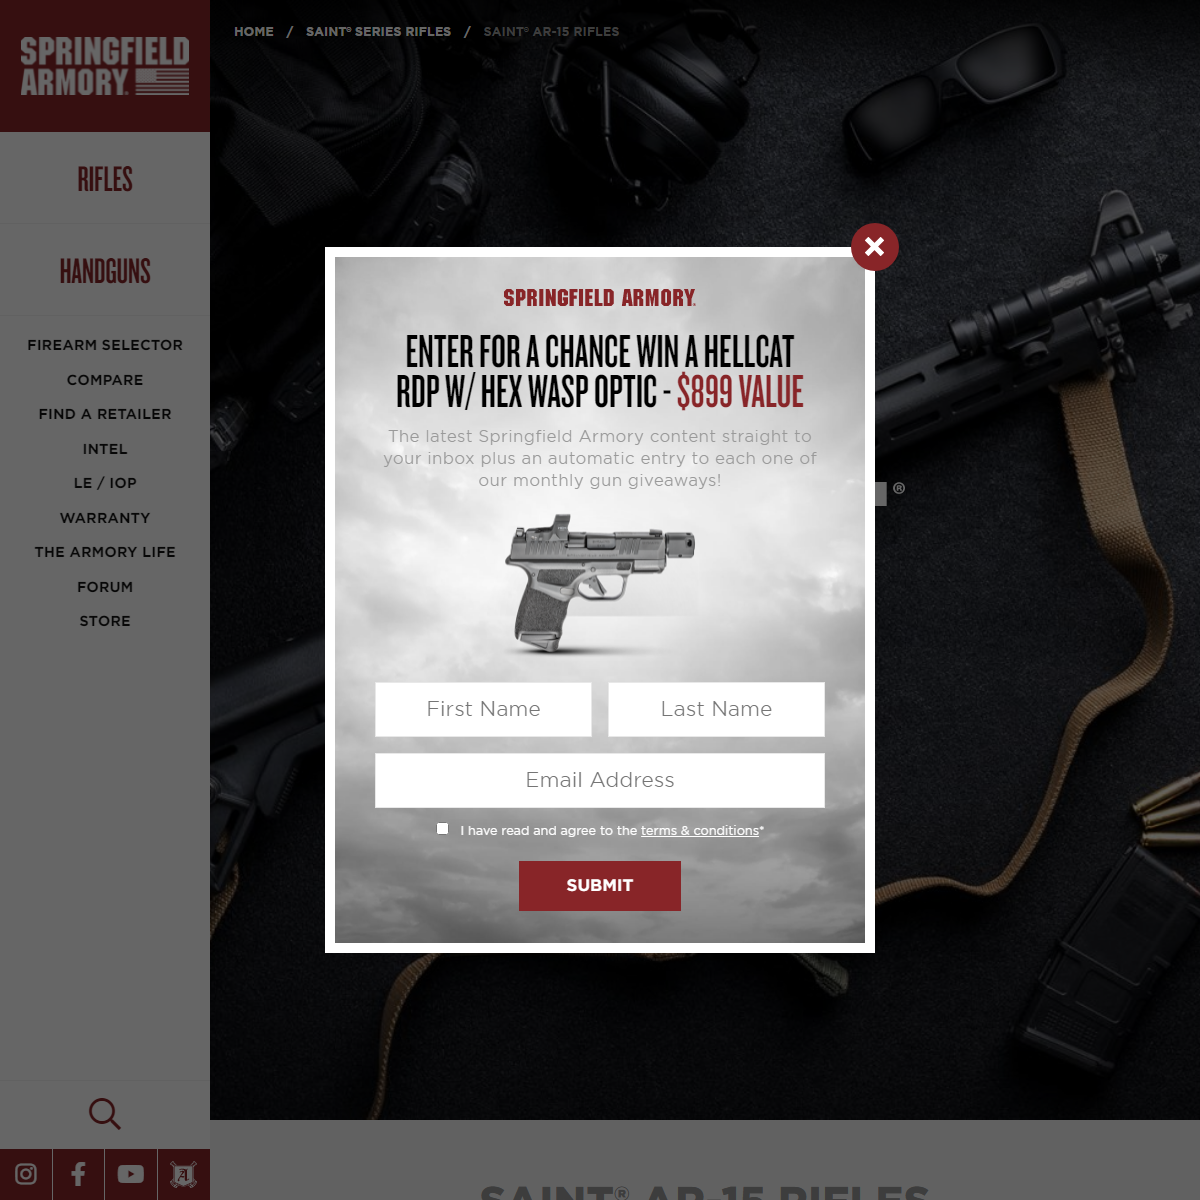 SAINT® AR-15 Rifles - Springfield Armory